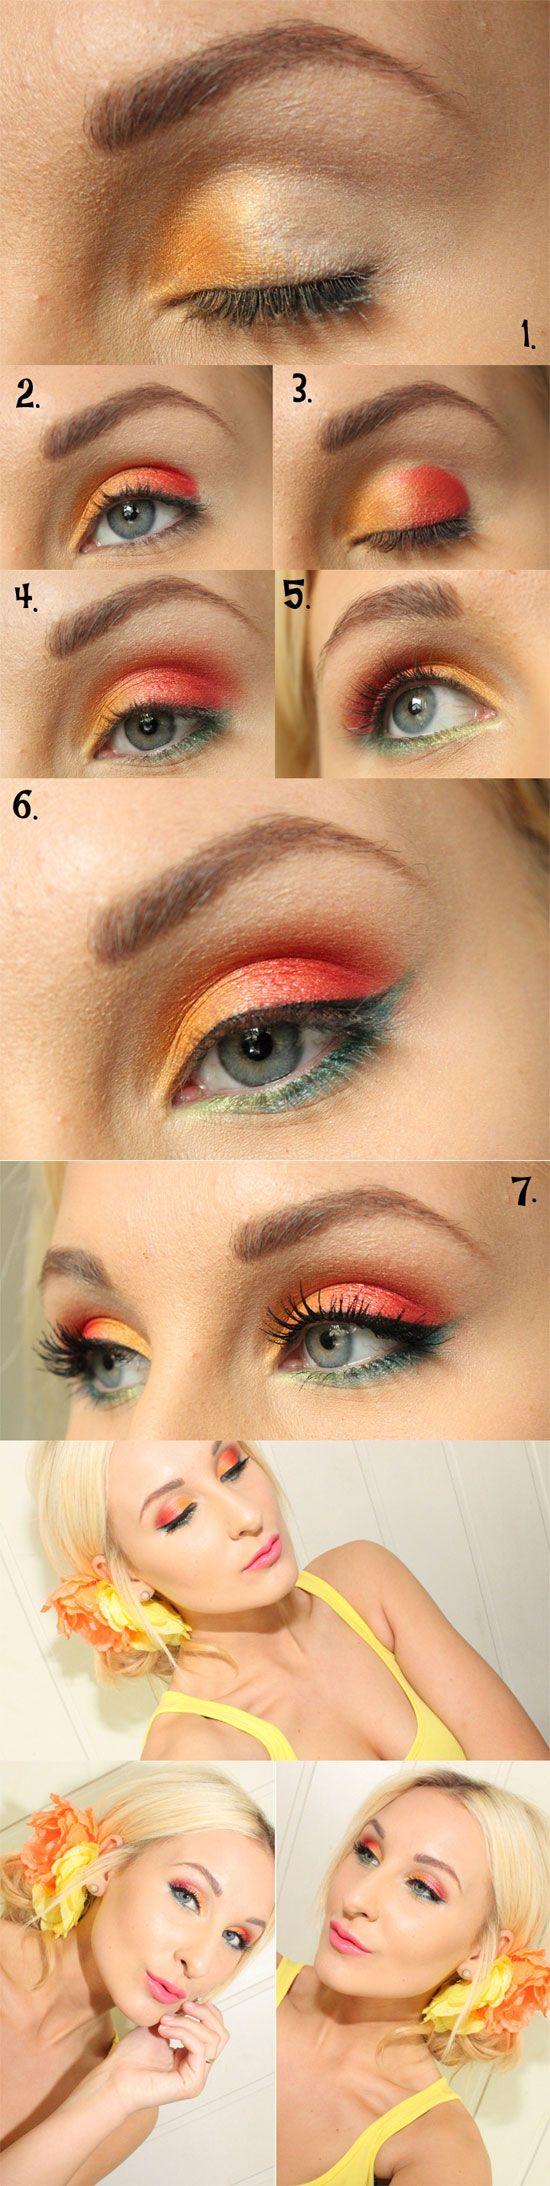 Amazing Yet Inspiring Eye Make Up Tutorials 2013 For Girls   Girlshue